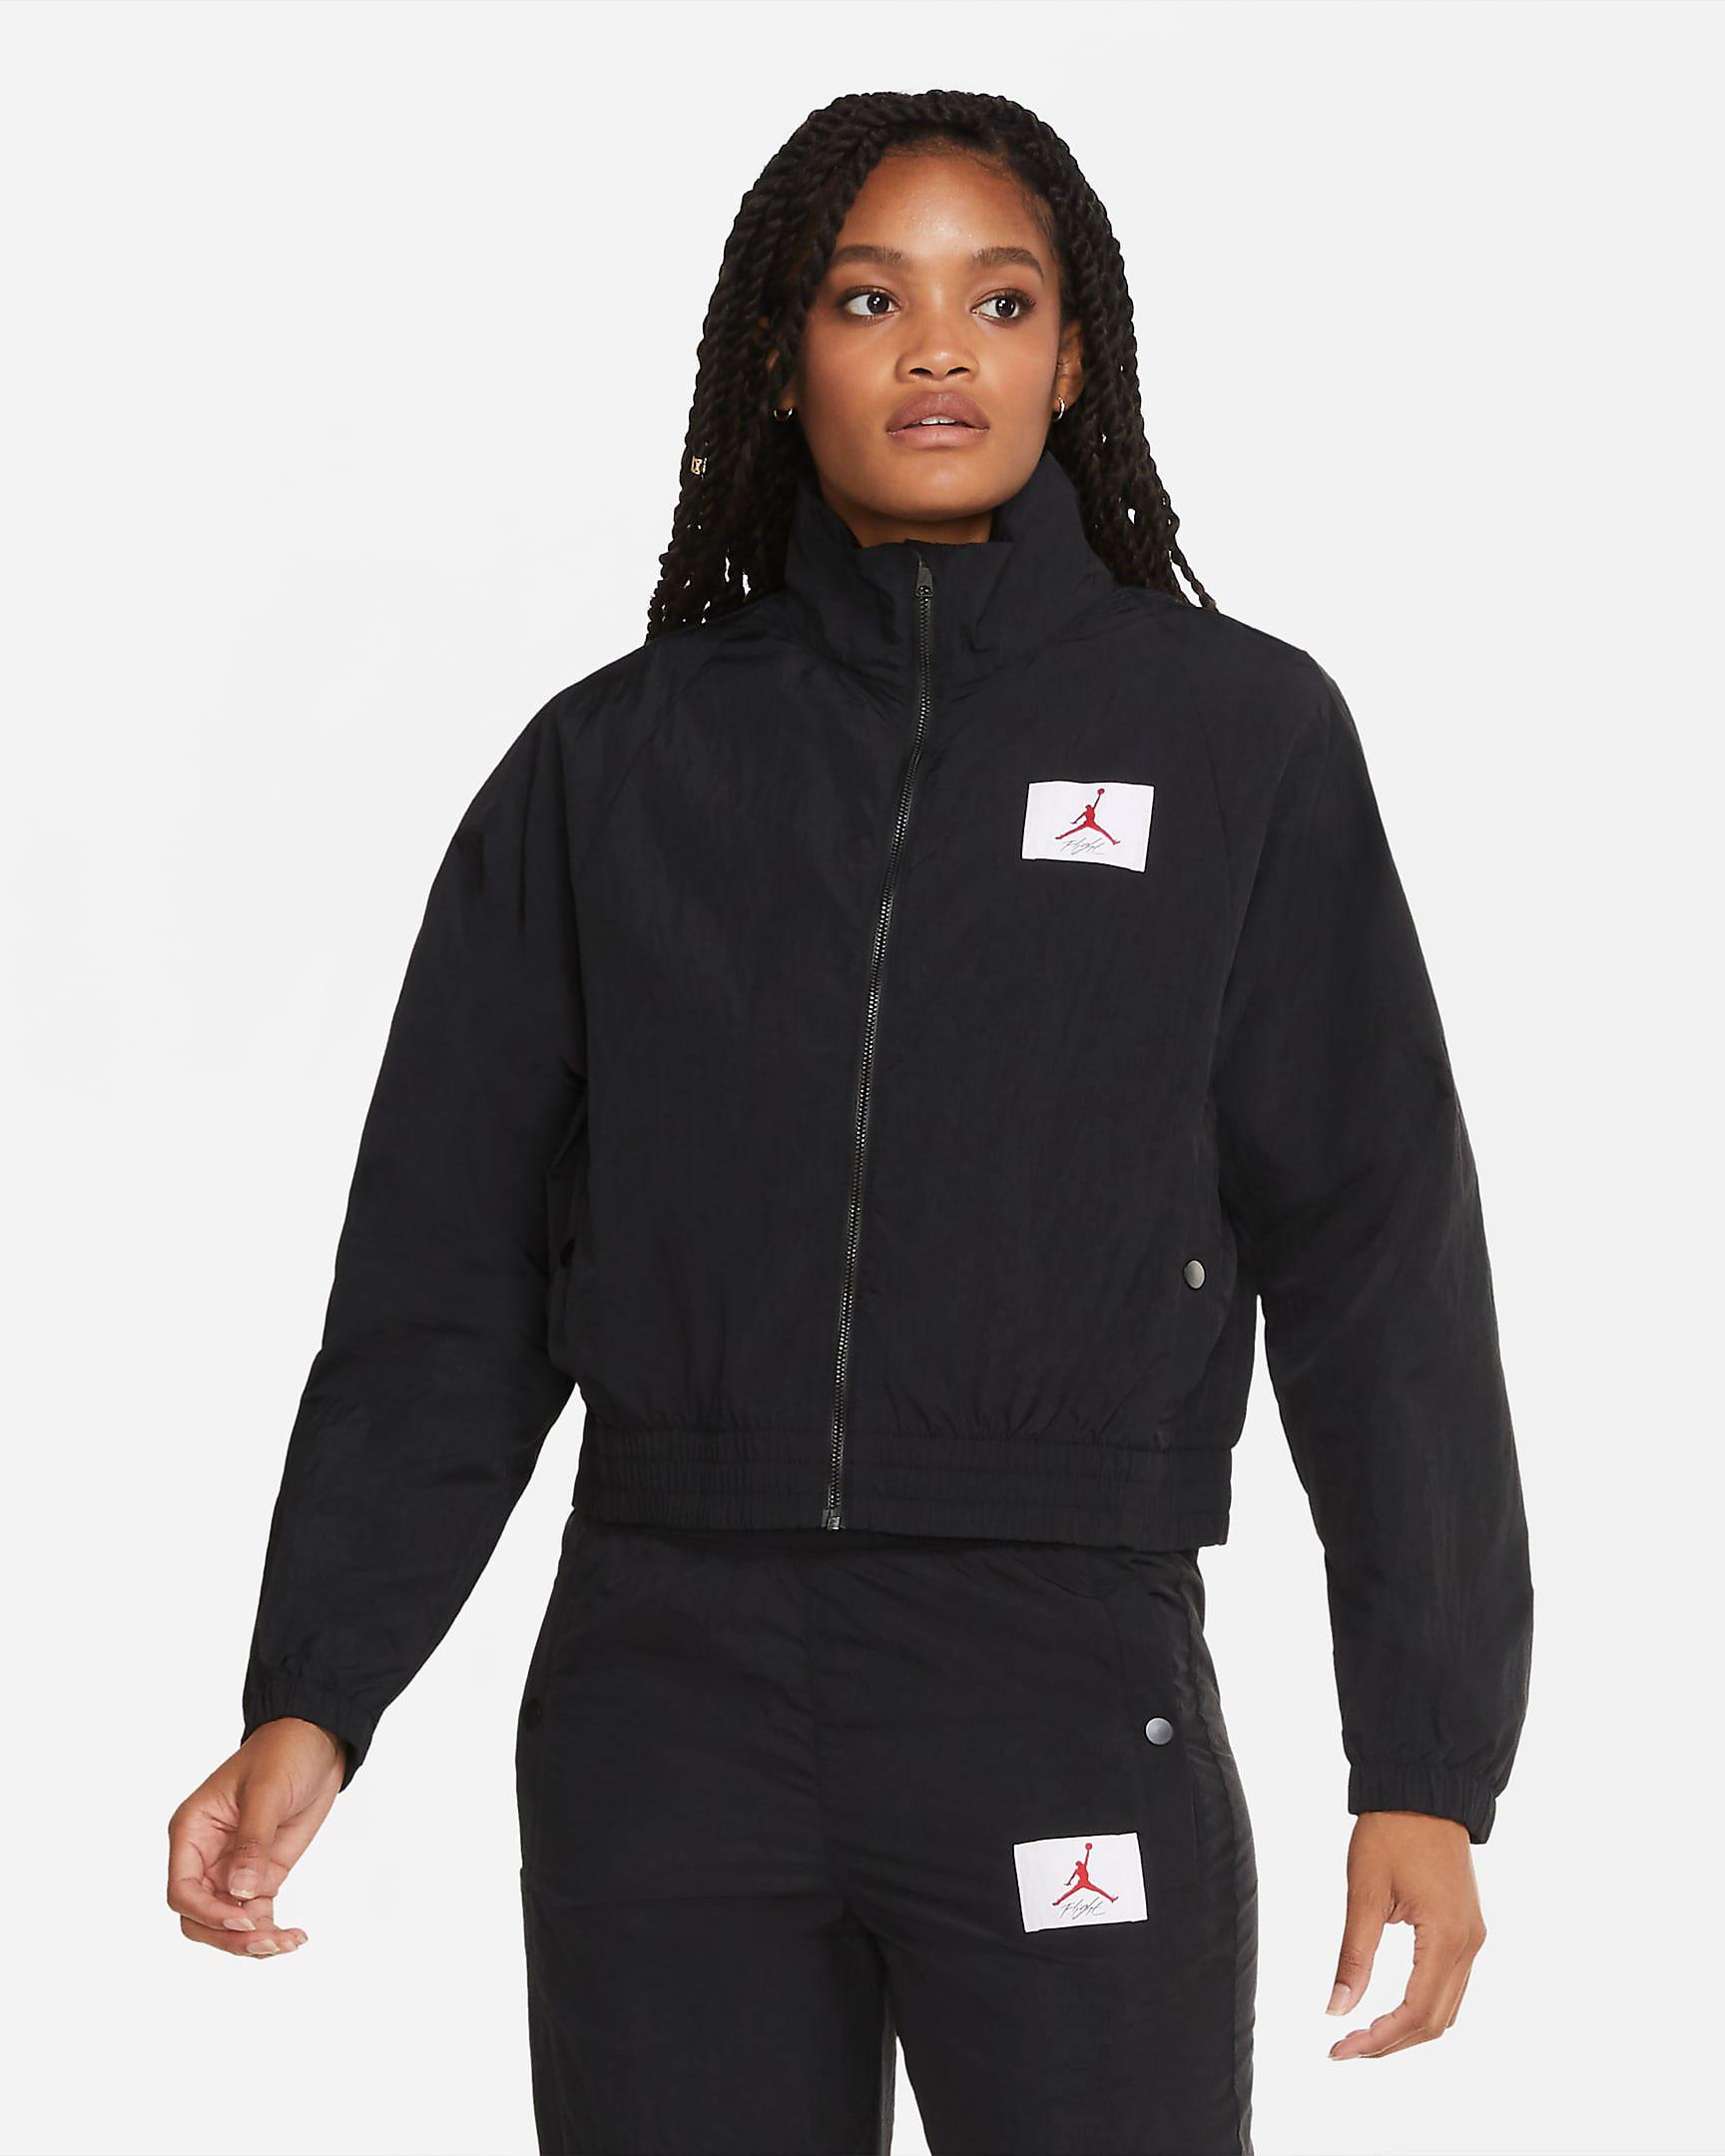 jordan-womens-woven-jacket-black